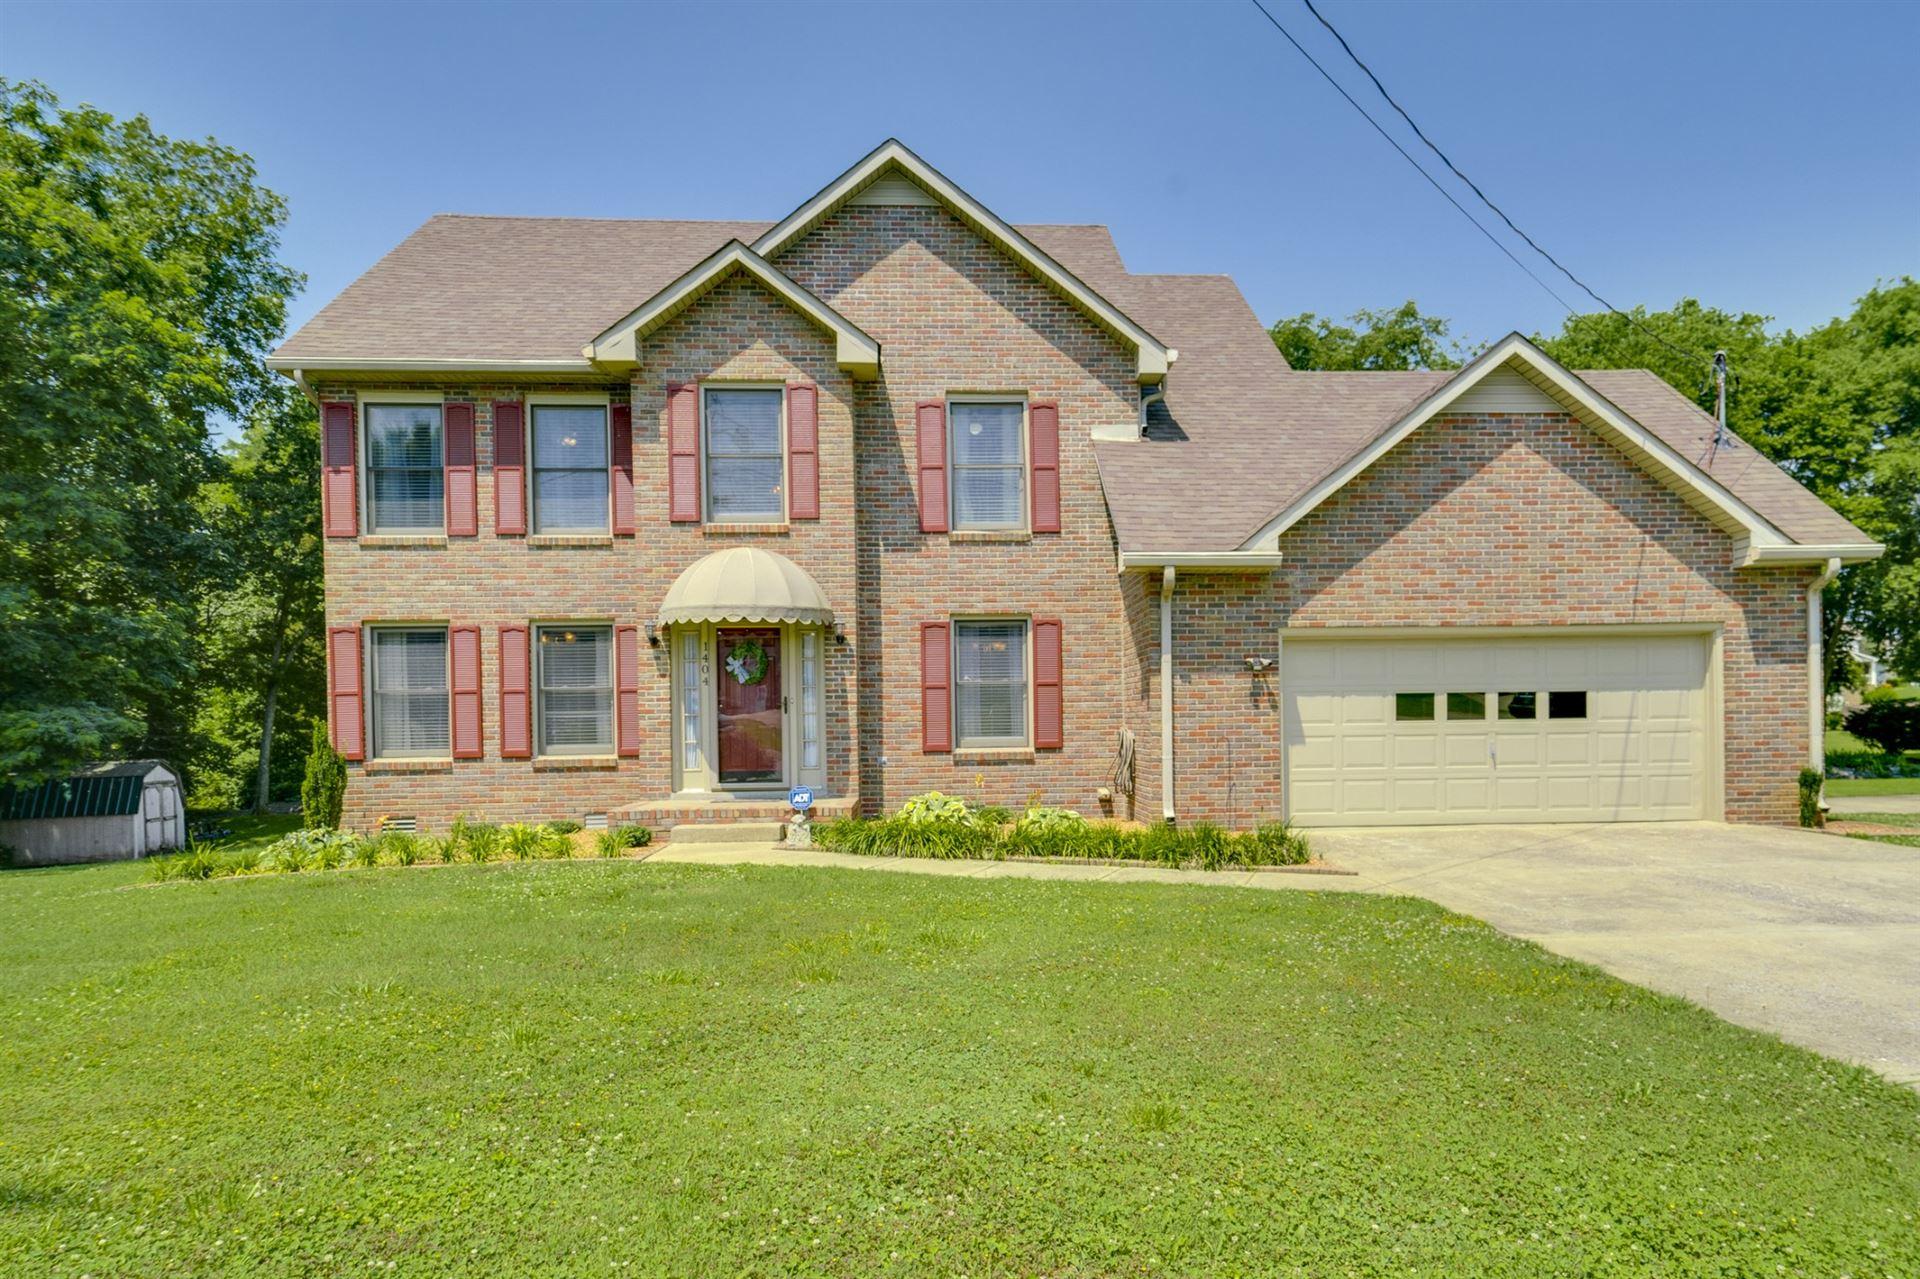 1404 S Callywood Ct, Clarksville, TN 37040 - MLS#: 2264385